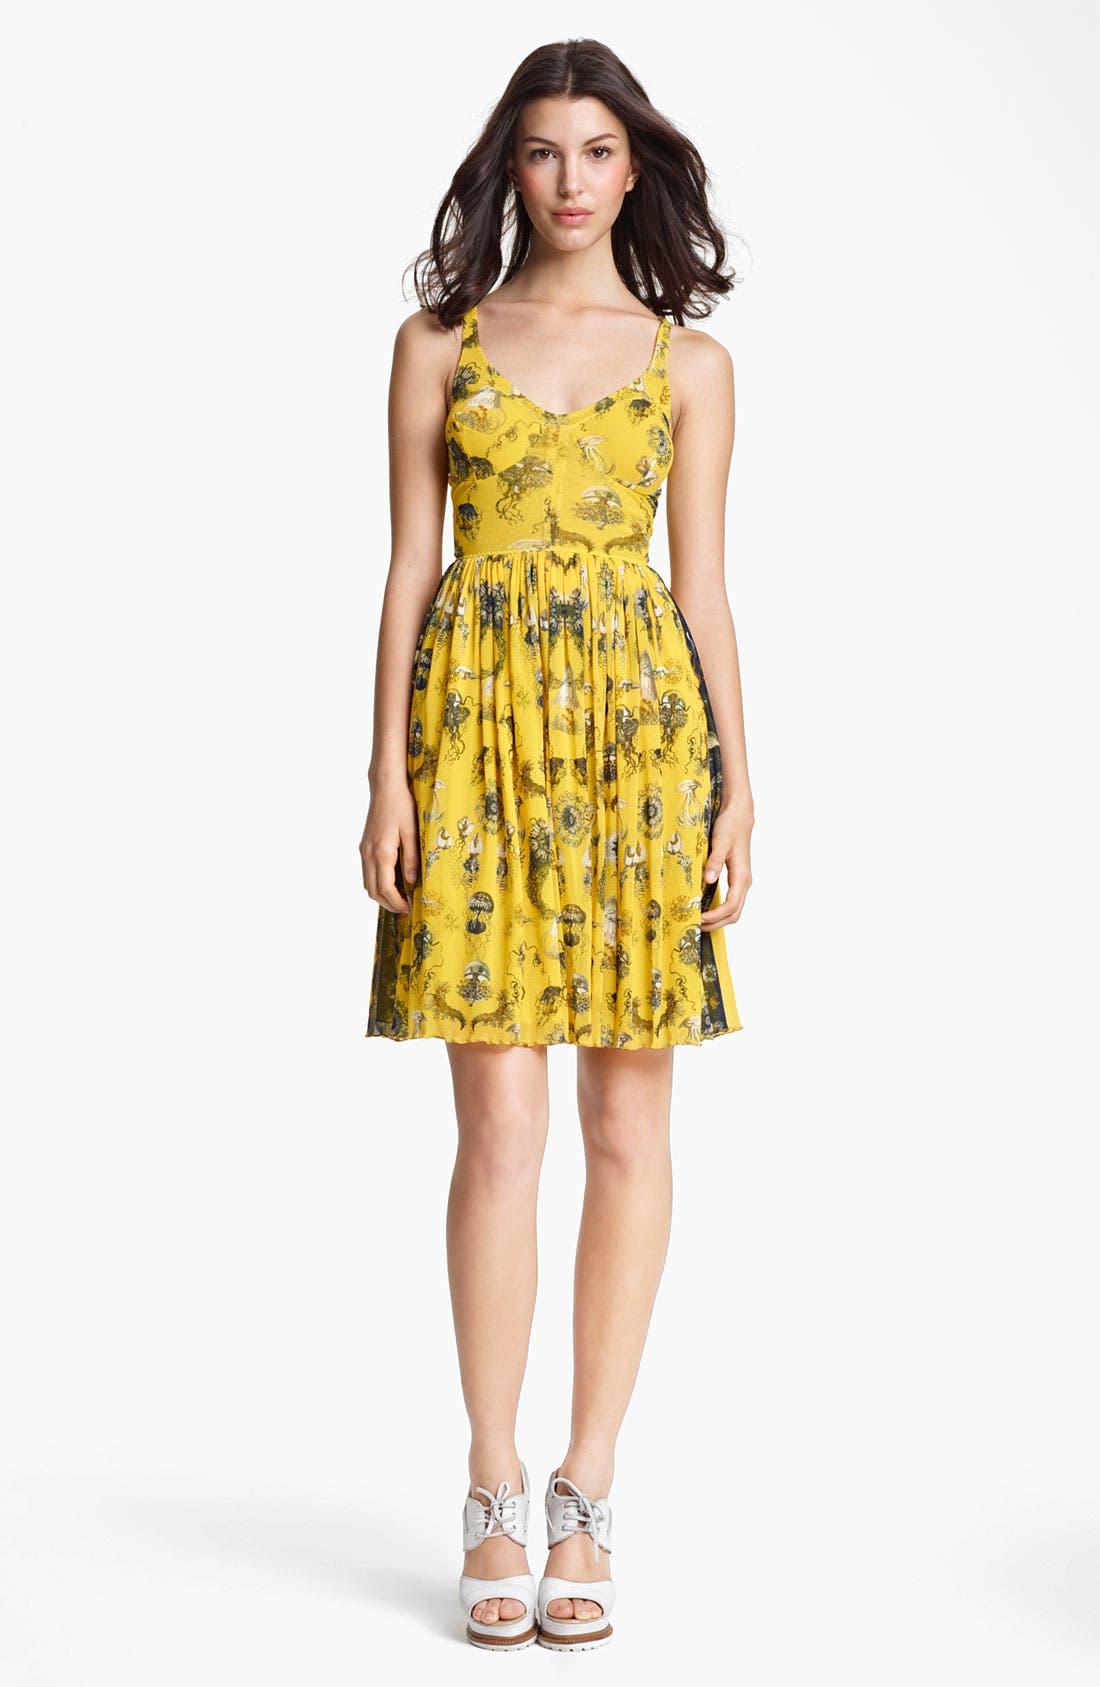 Alternate Image 1 Selected - Jean Paul Gaultier Fuzzi 'Fruit de la Mer' Print Tulle Dress